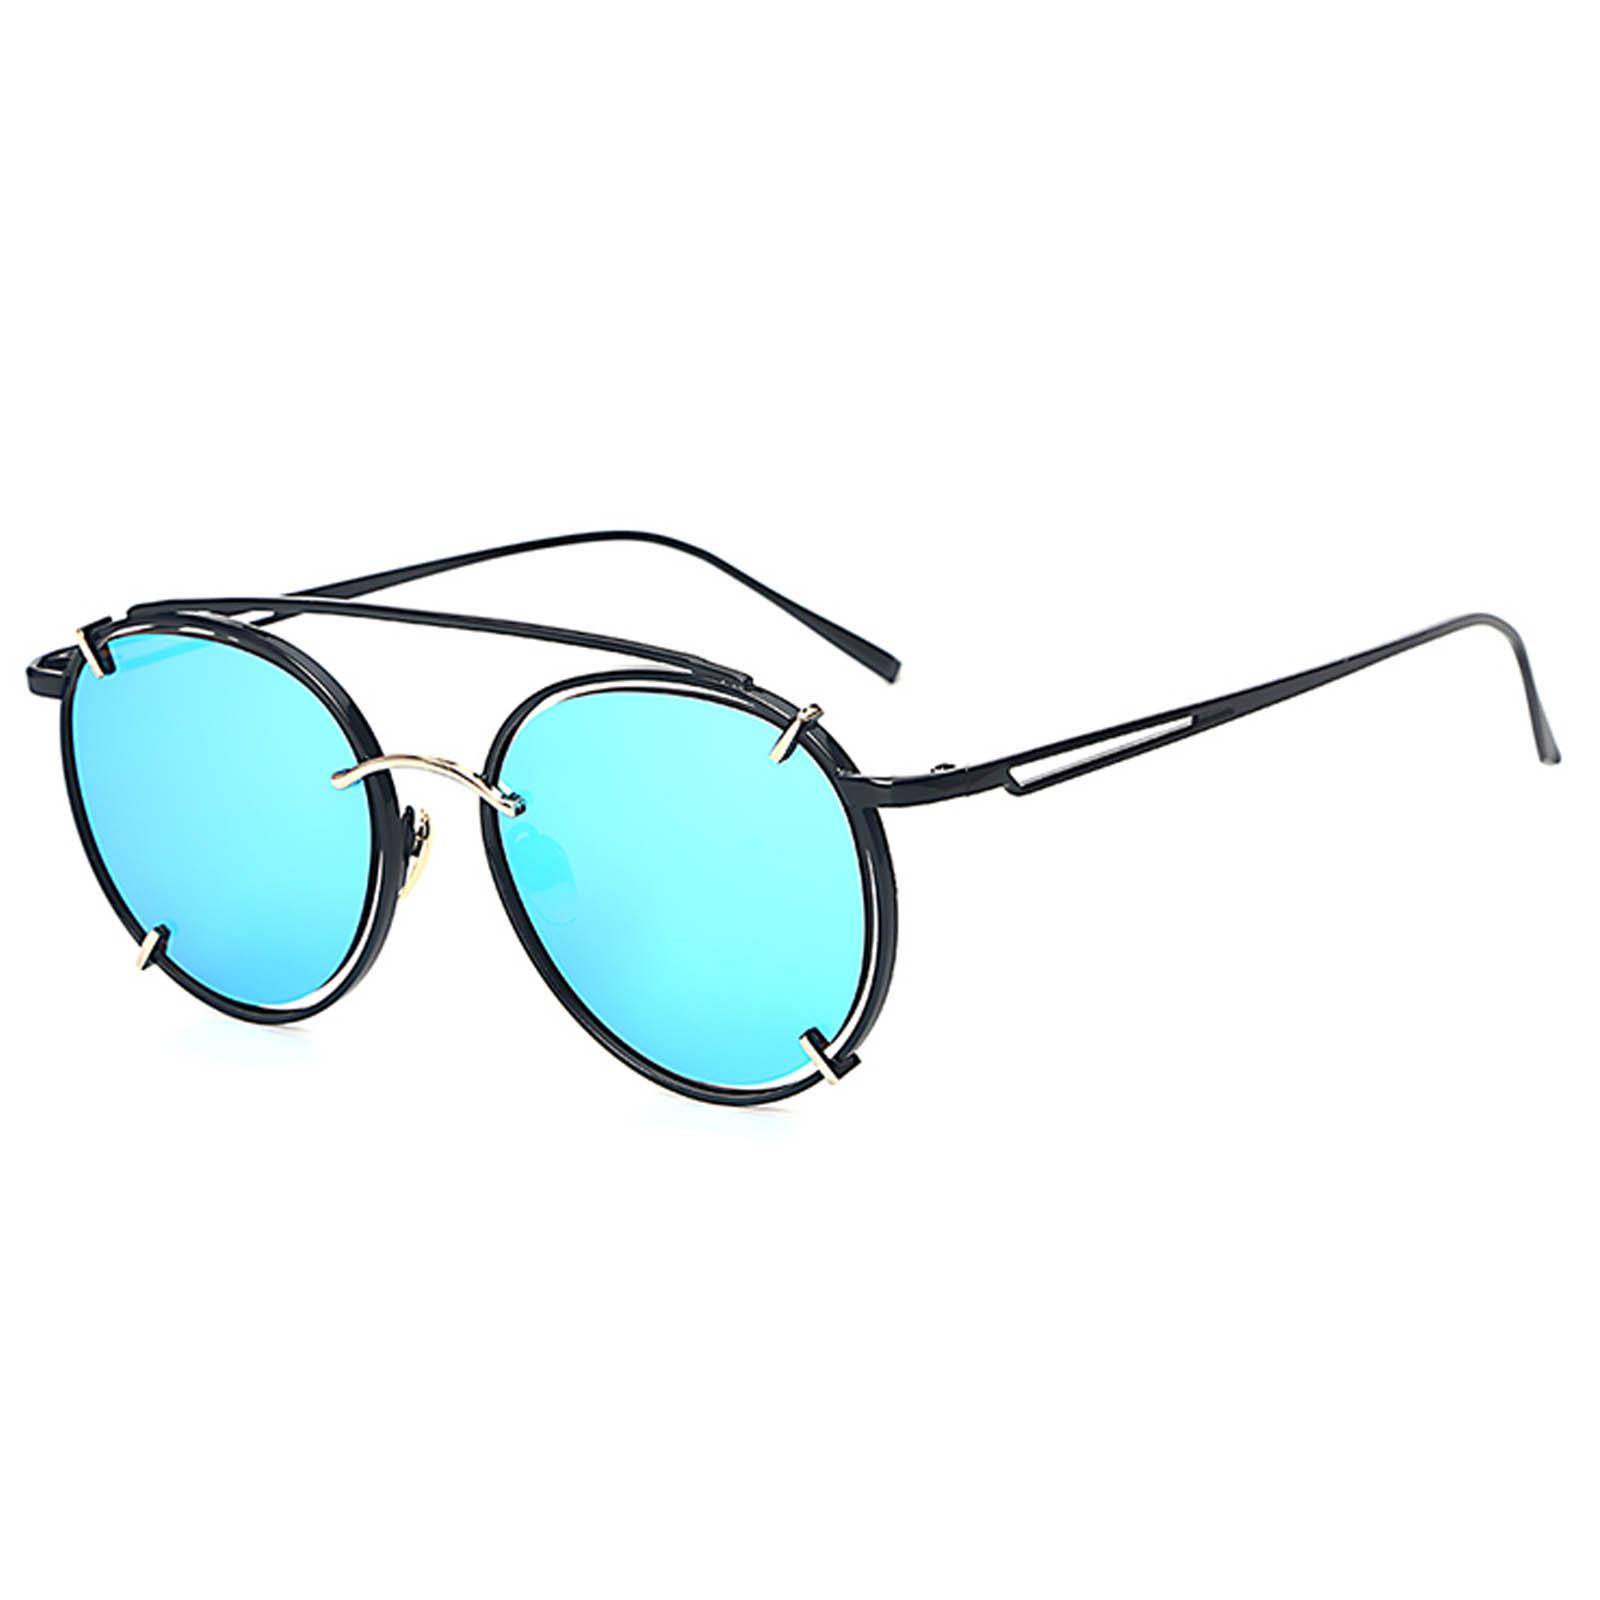 OWL ® 009 C4 Round Eyewear Sunglasses Women s Men s Metal Round Circle  Black Frame Blue Mirror dacc2cc85